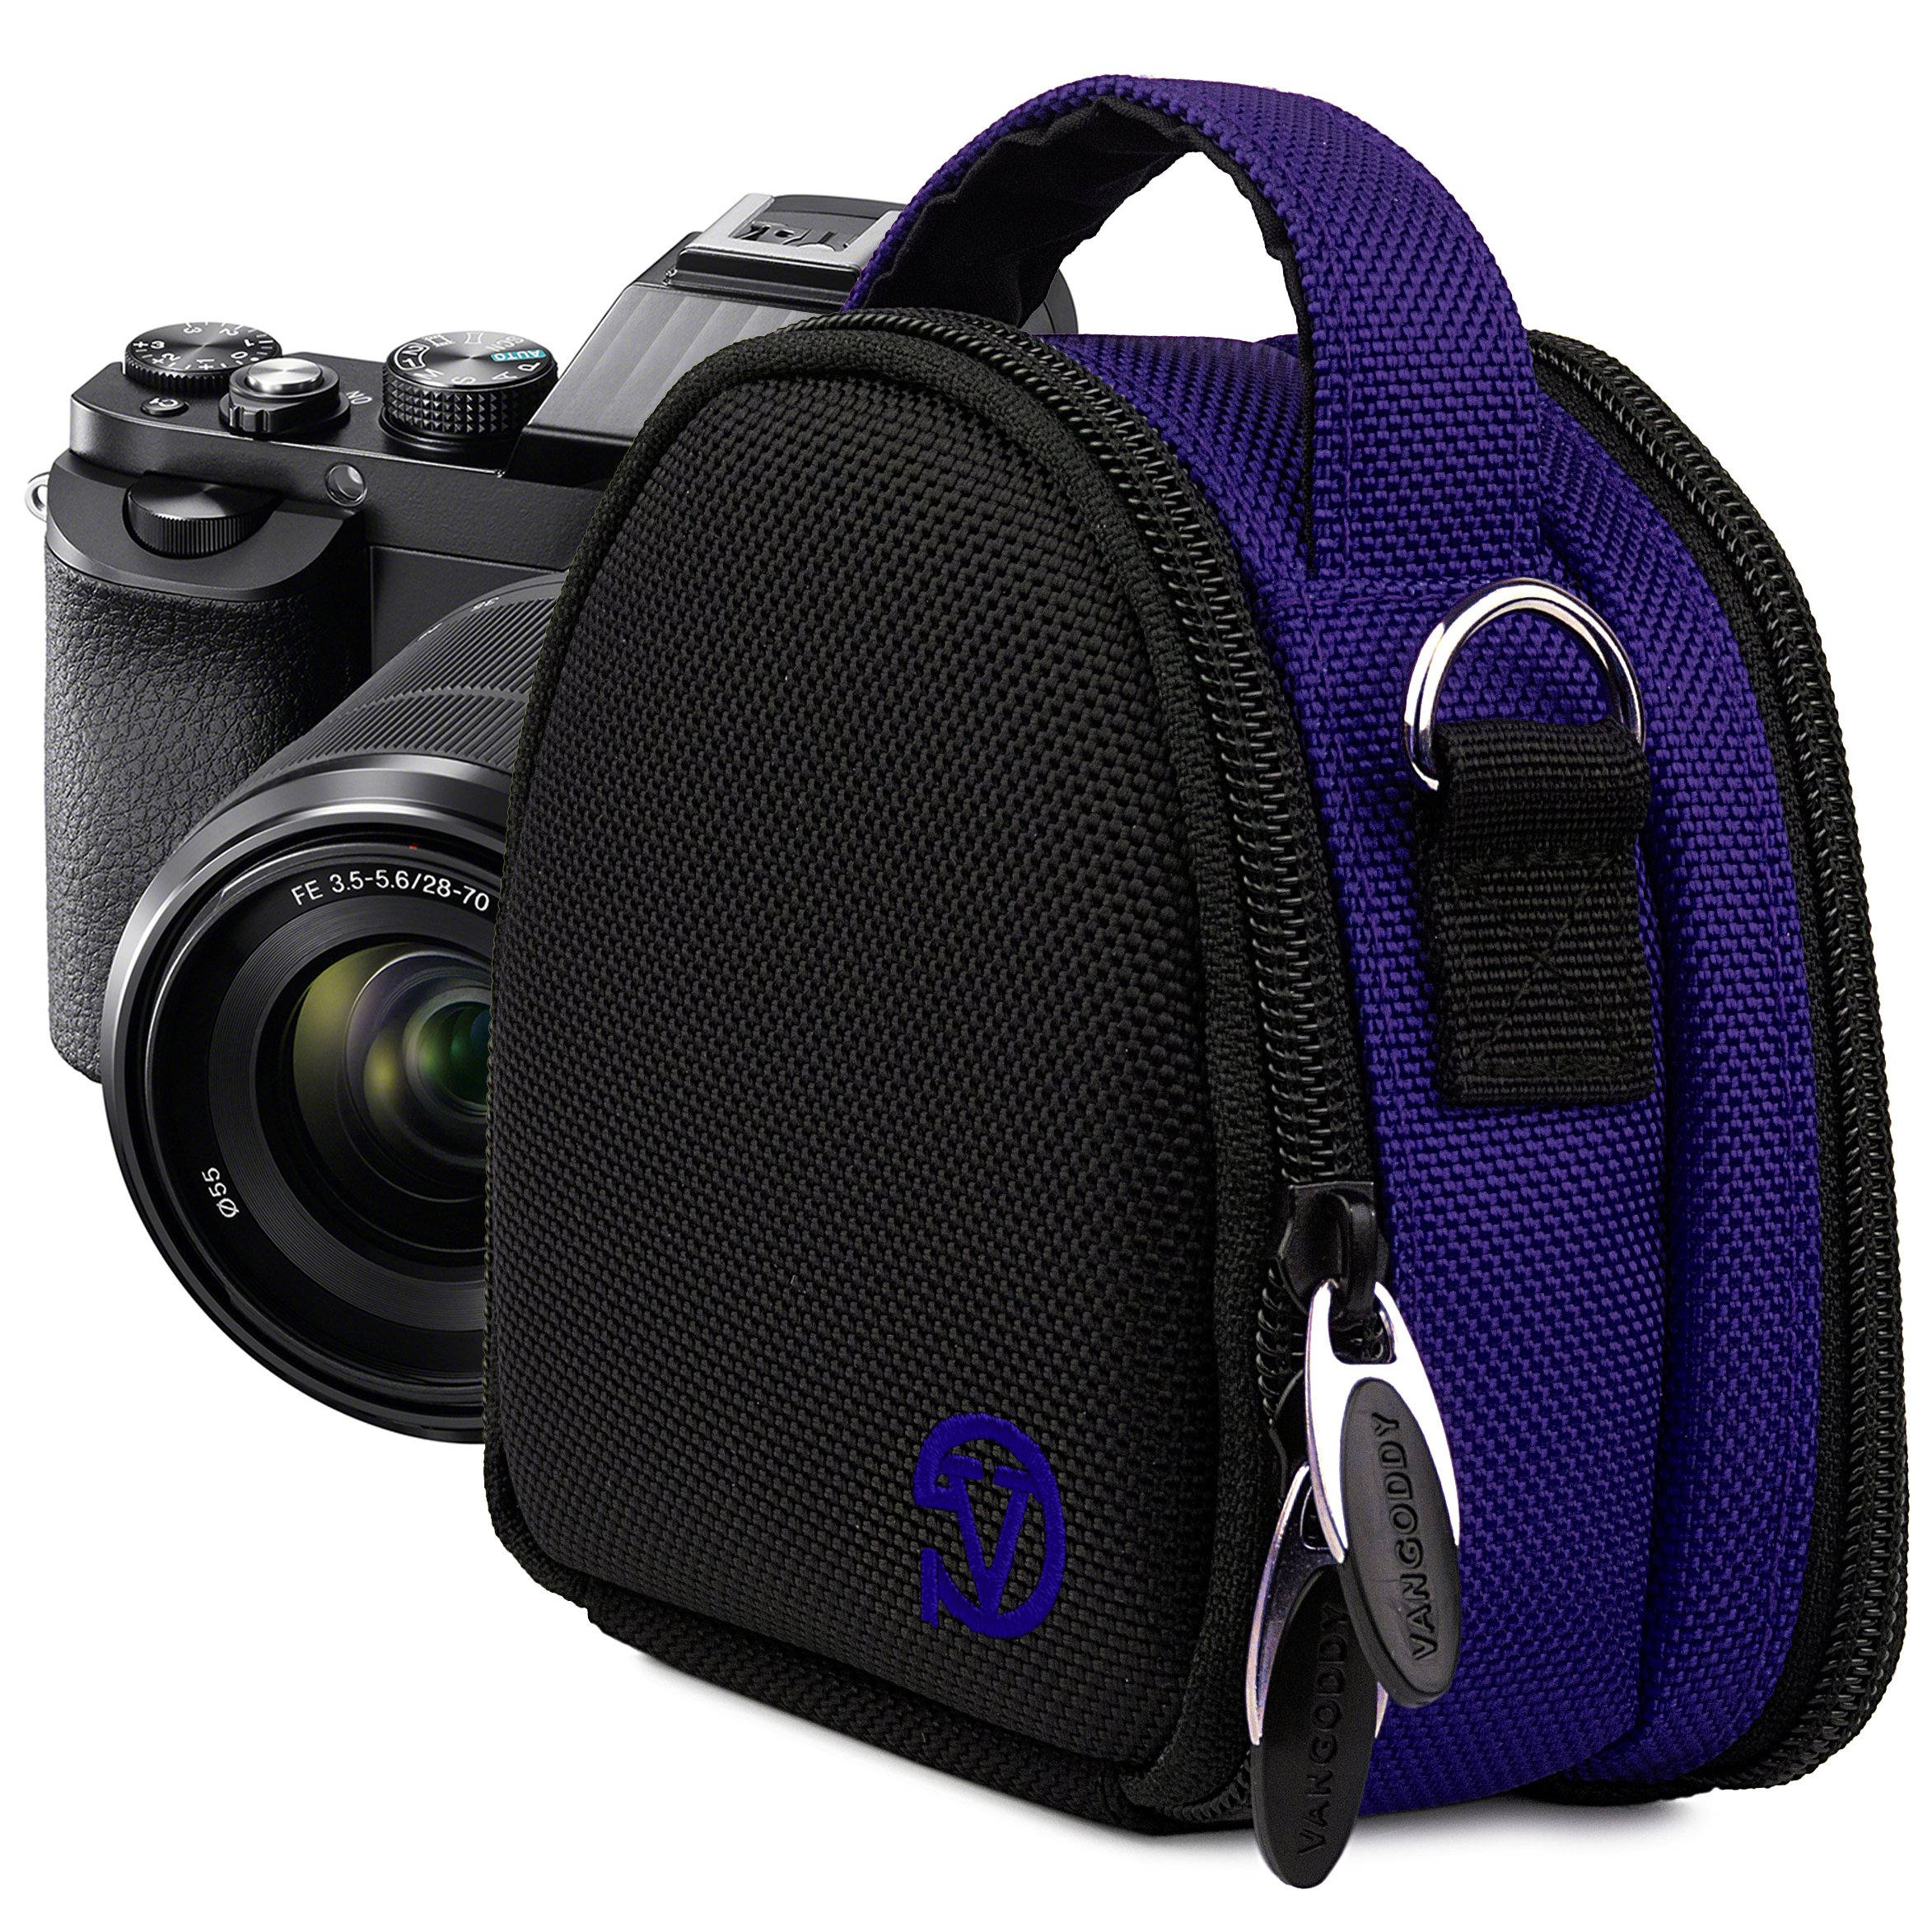 VanGoddy Compact Mini Laurel Navy Blue Camera Pouch Cover Bag fits Canon PowerShot G7 X, N100, N Facebook, SX600, SX260, S120, S110 HS